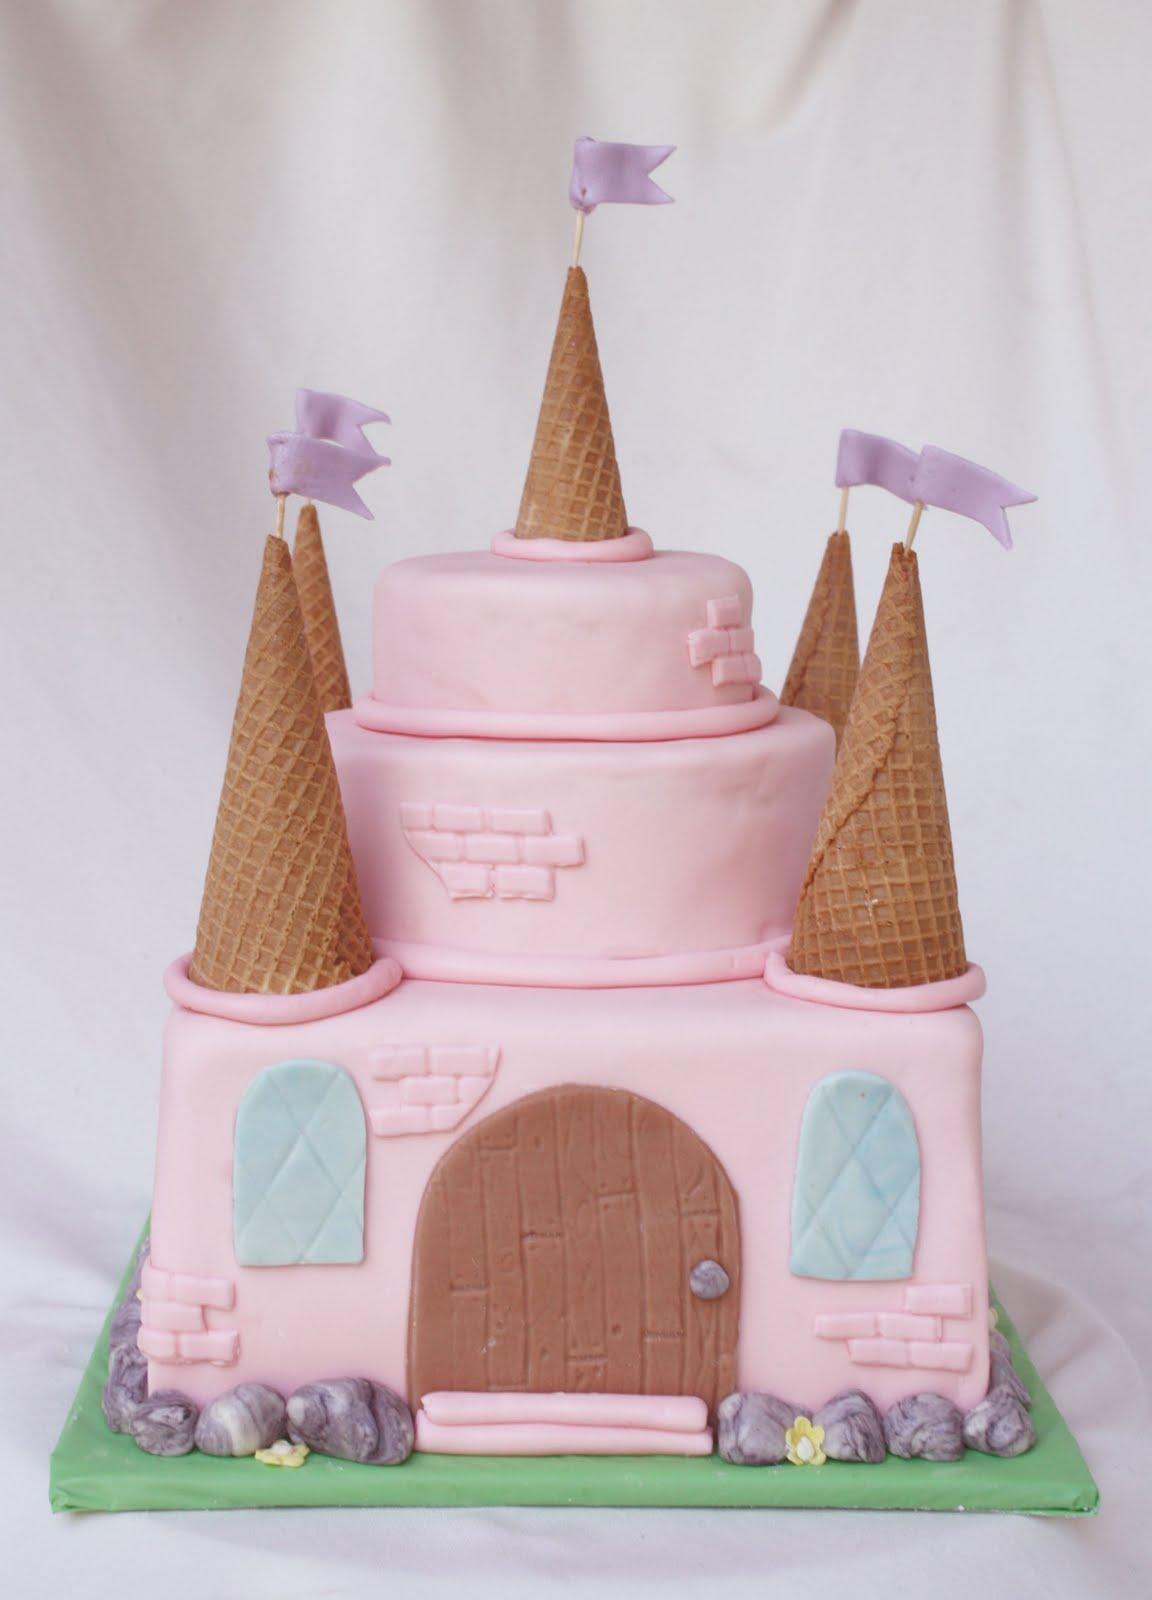 Simple Princess Cake Design : Girlie pink fairy princess castle cake with three also ...